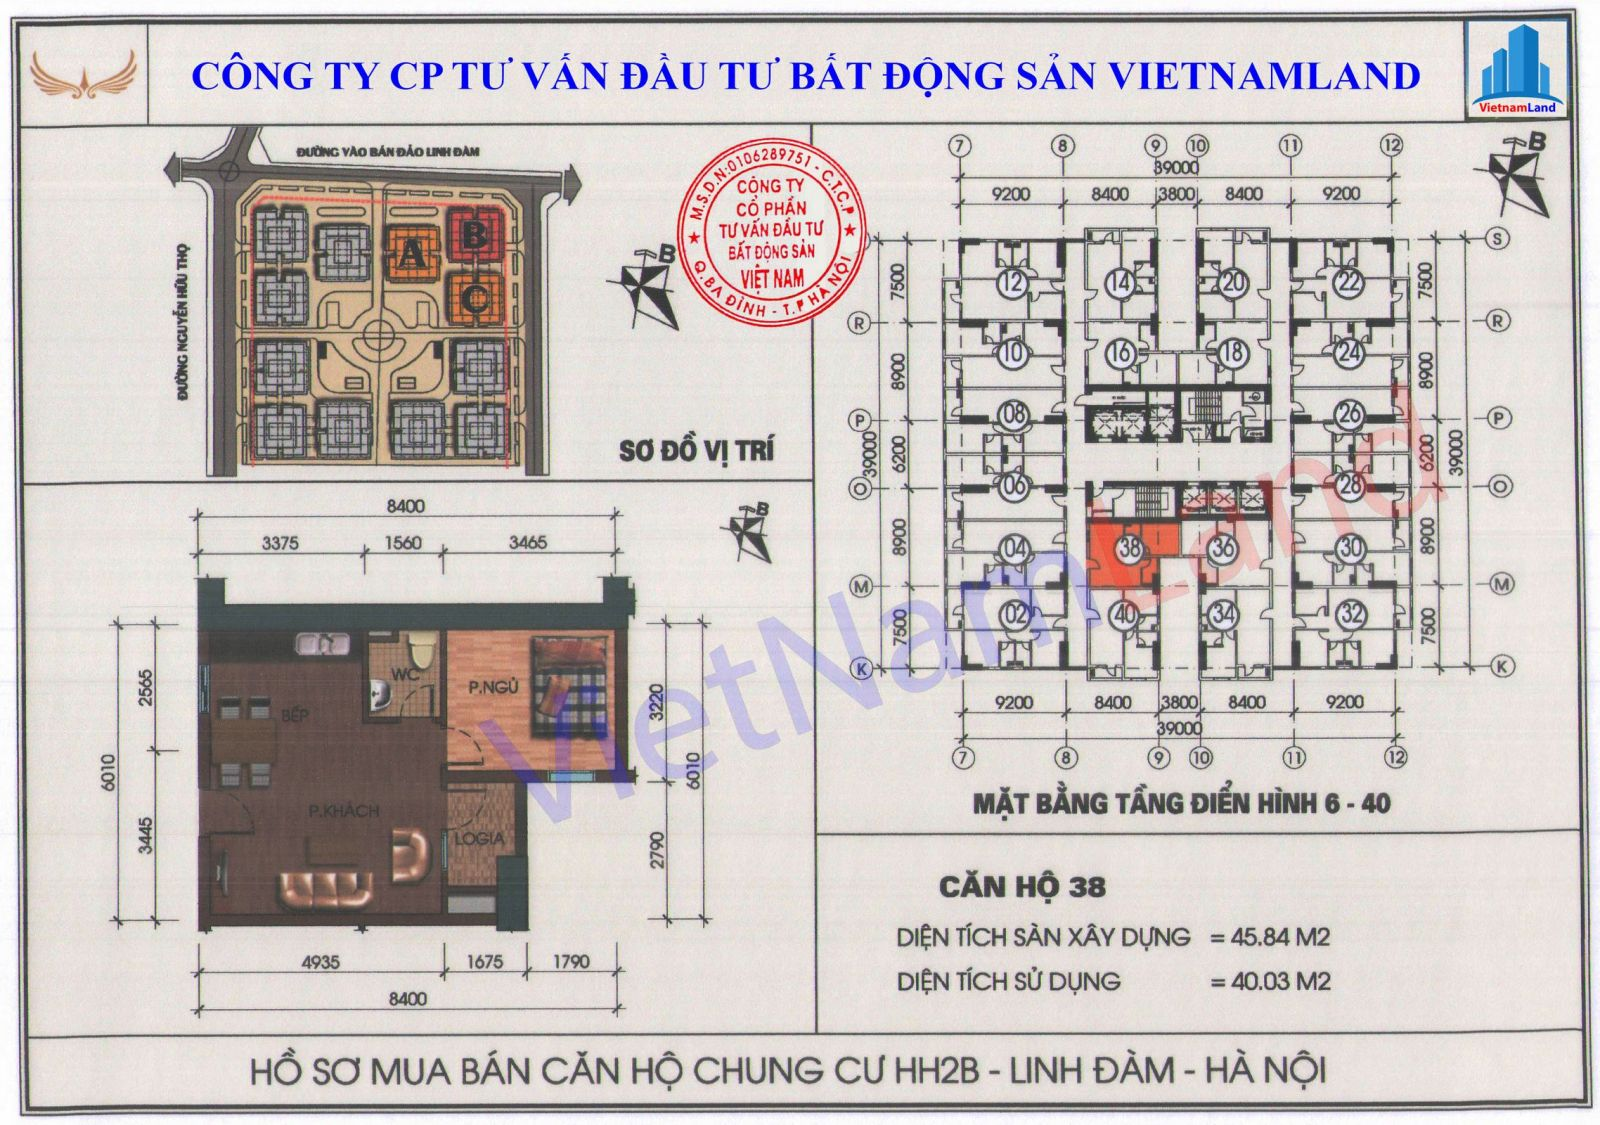 can-38-hh2b-linh-dam